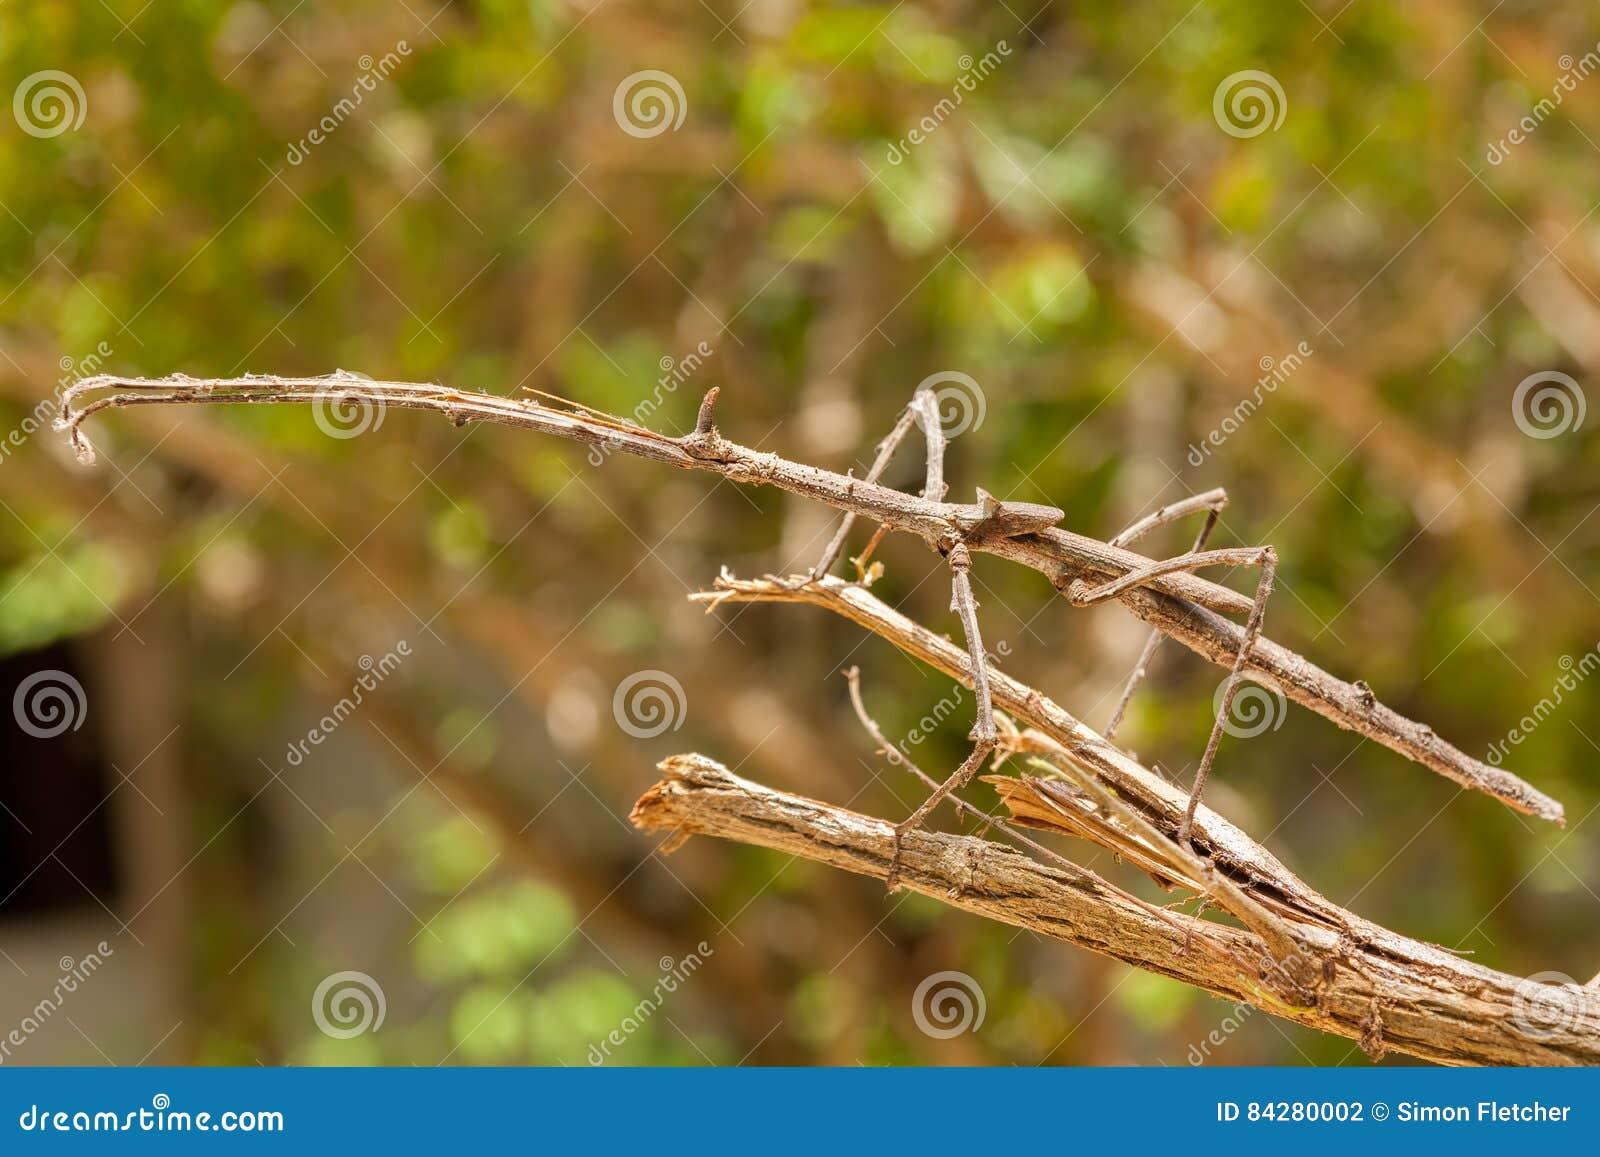 Big Stick Insect in Zanzibar